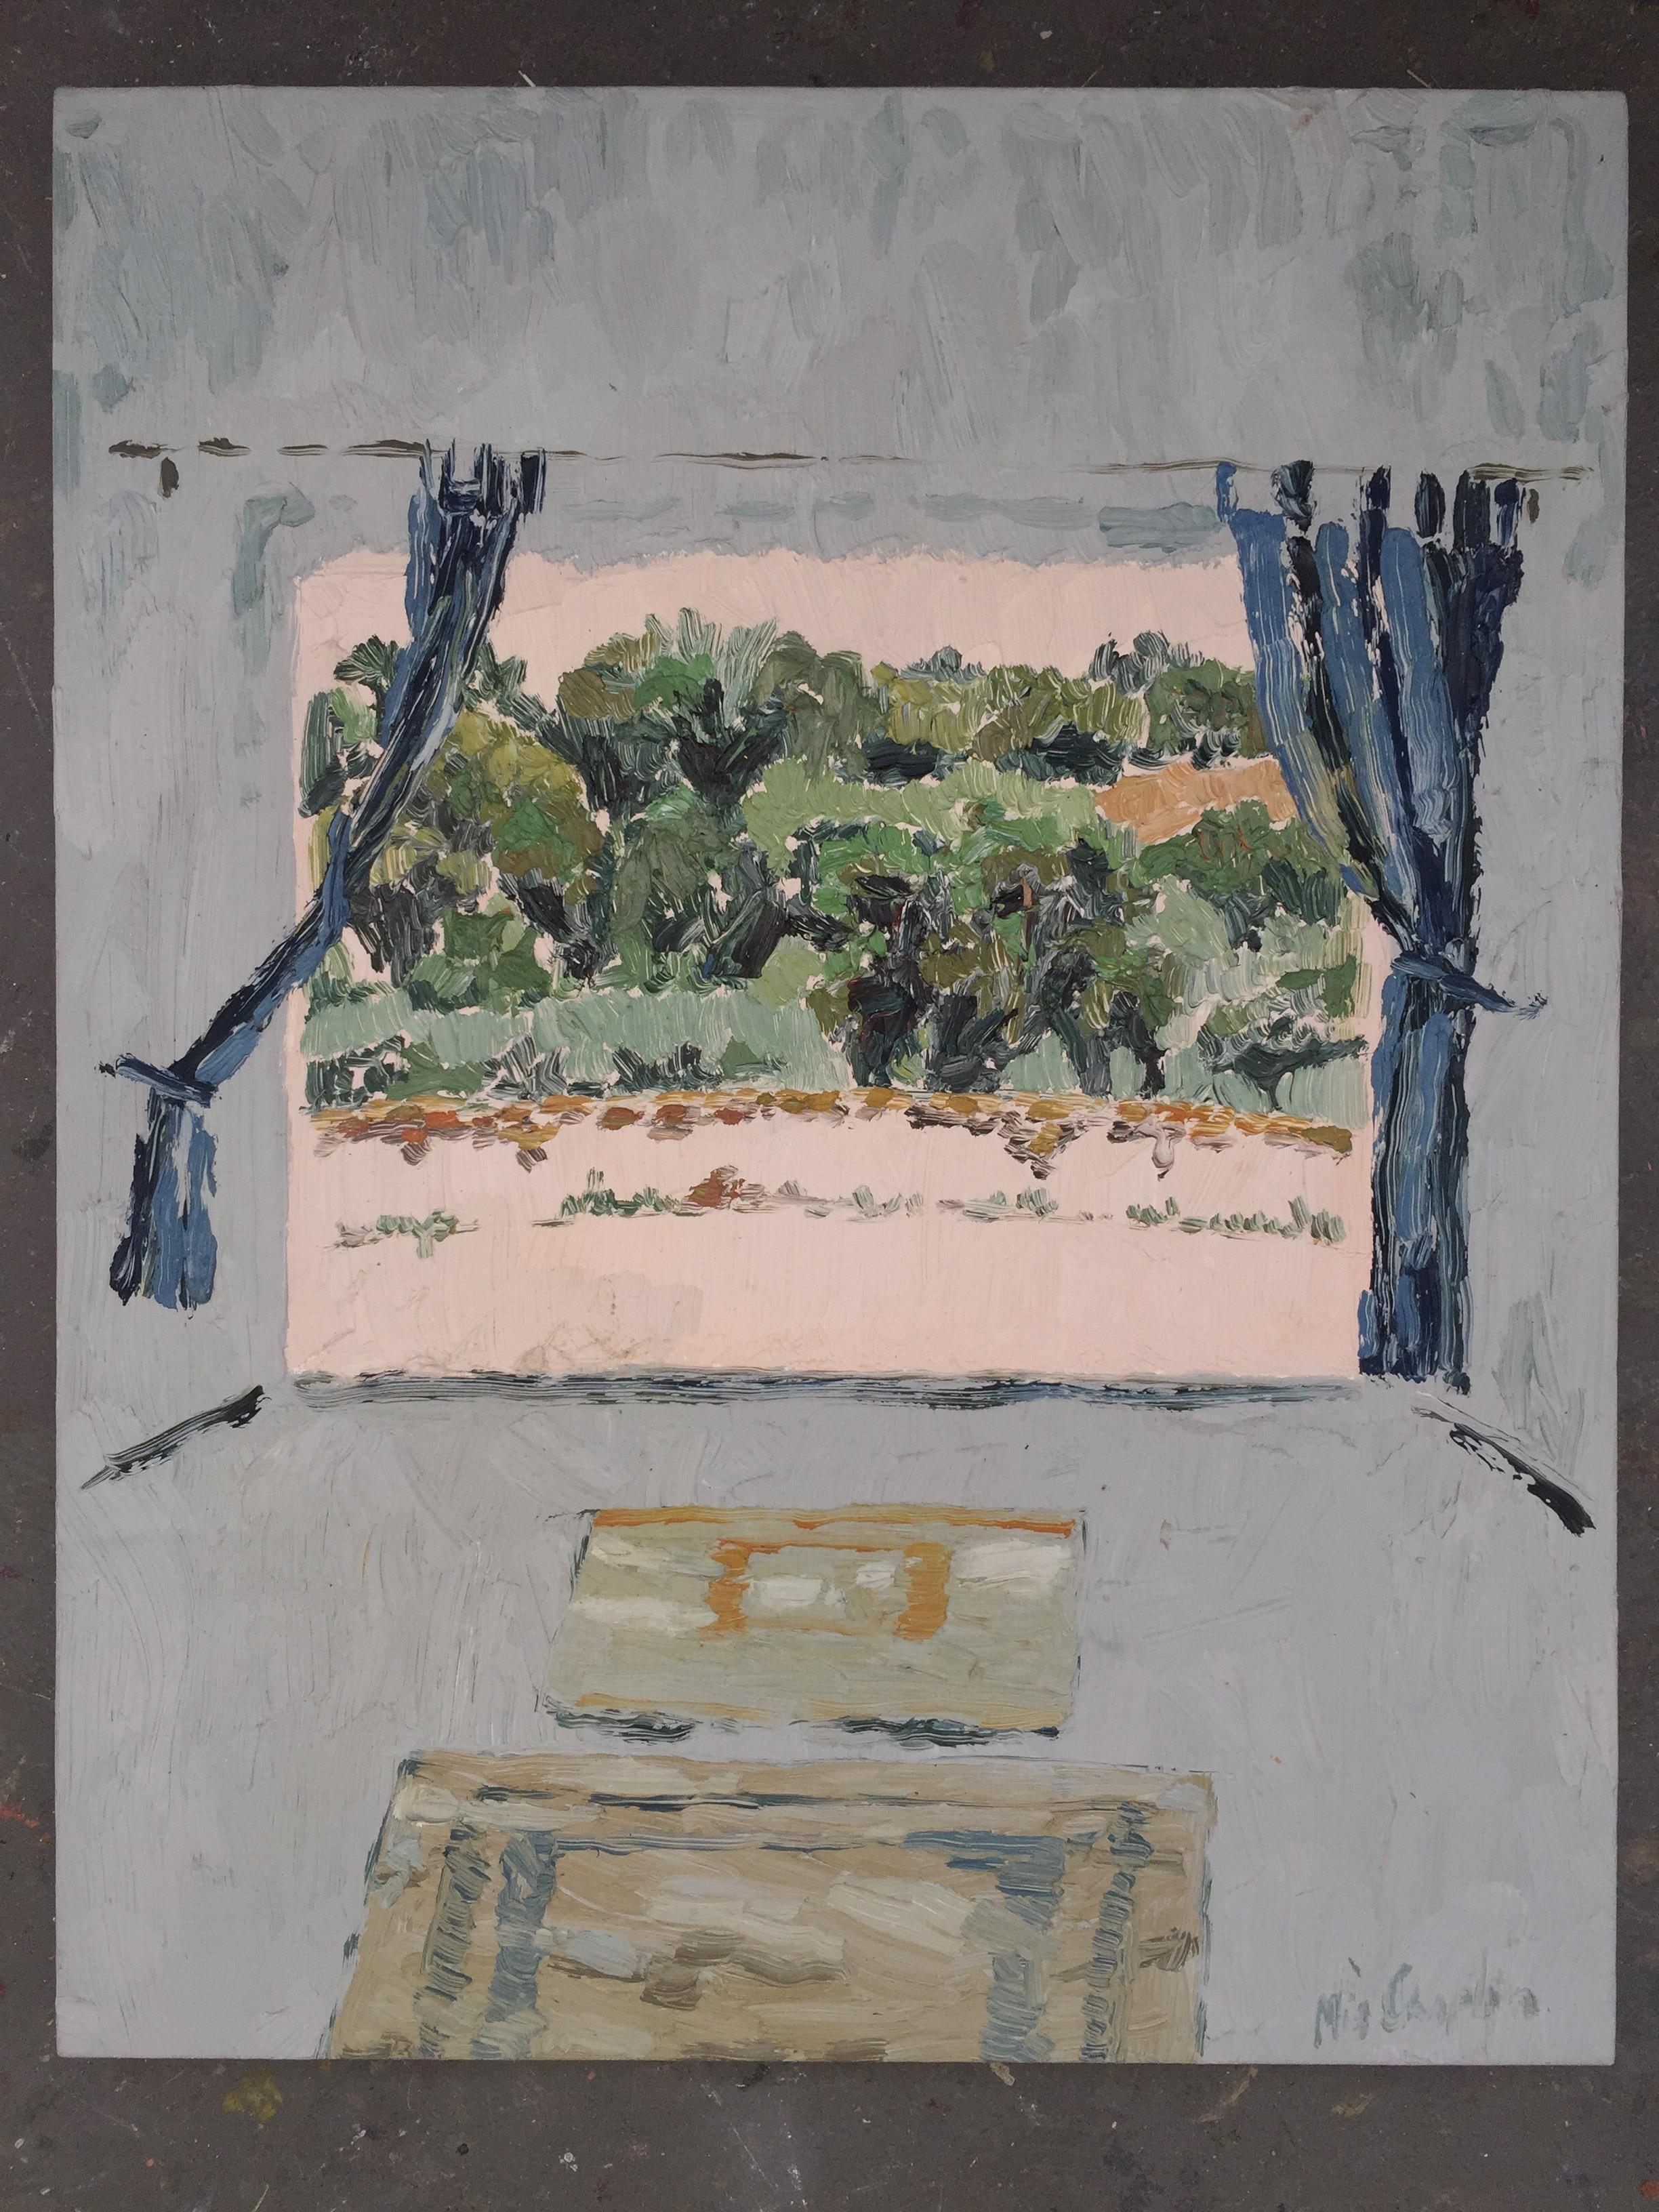 Mia Chaplin ,Baby Blue studio at Evoramonte. 2015  72.5 x 53.5cm  Oil on Paper  Framed – R15000